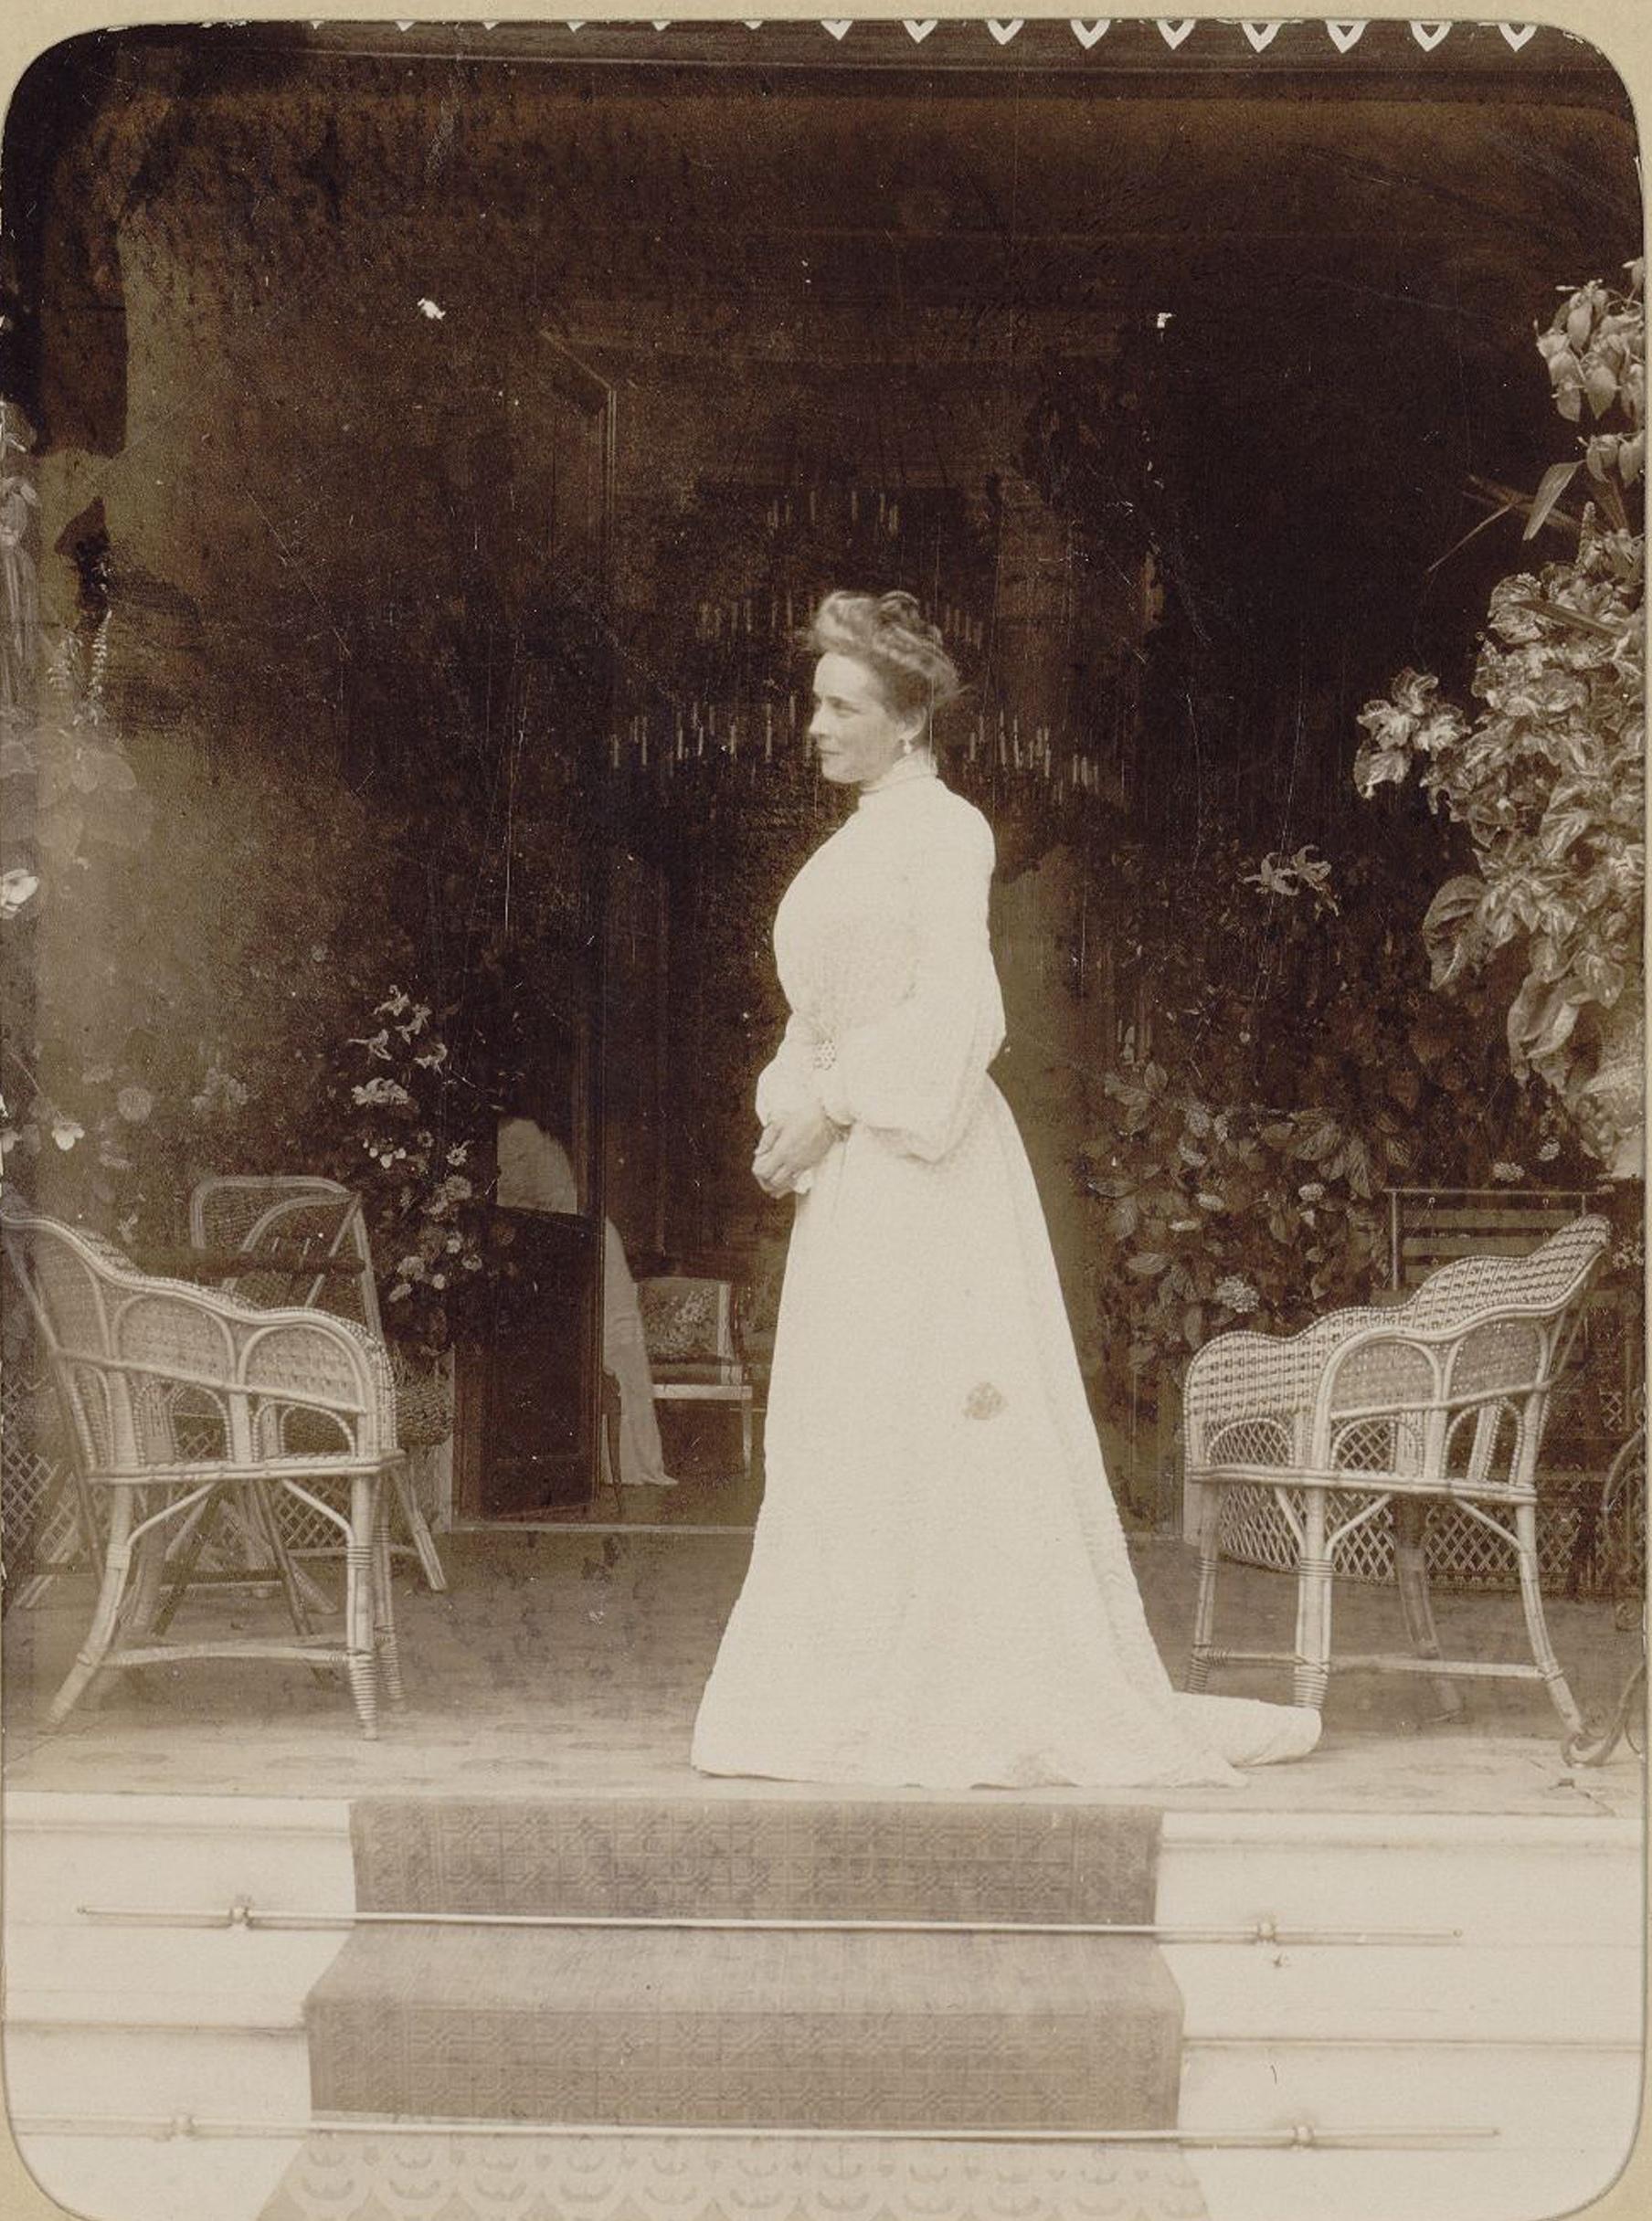 Княгиня З.Н. Юсупова, графиня Сумарокова-Эльстон на ступенях полуротонды дворца. 1900-е